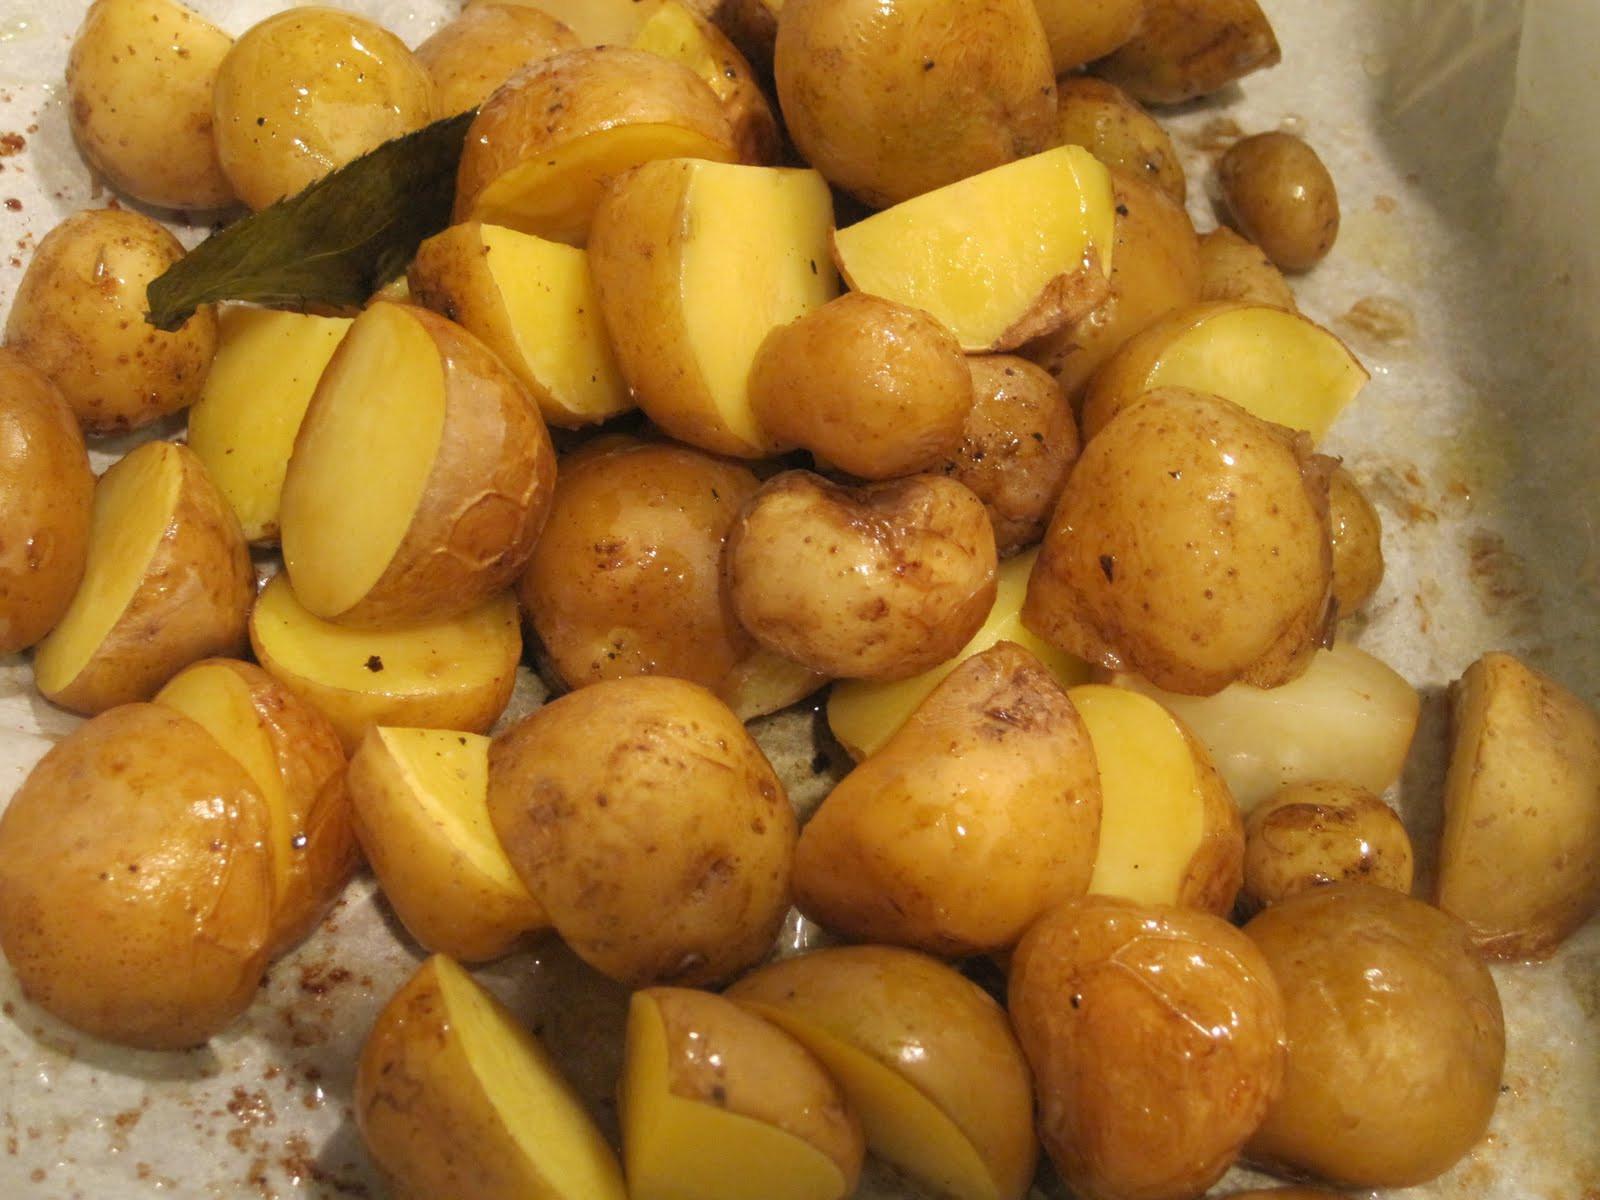 New Potato Recipe  New Potatoes With Cheese And Tomatoes Recipe — Dishmaps